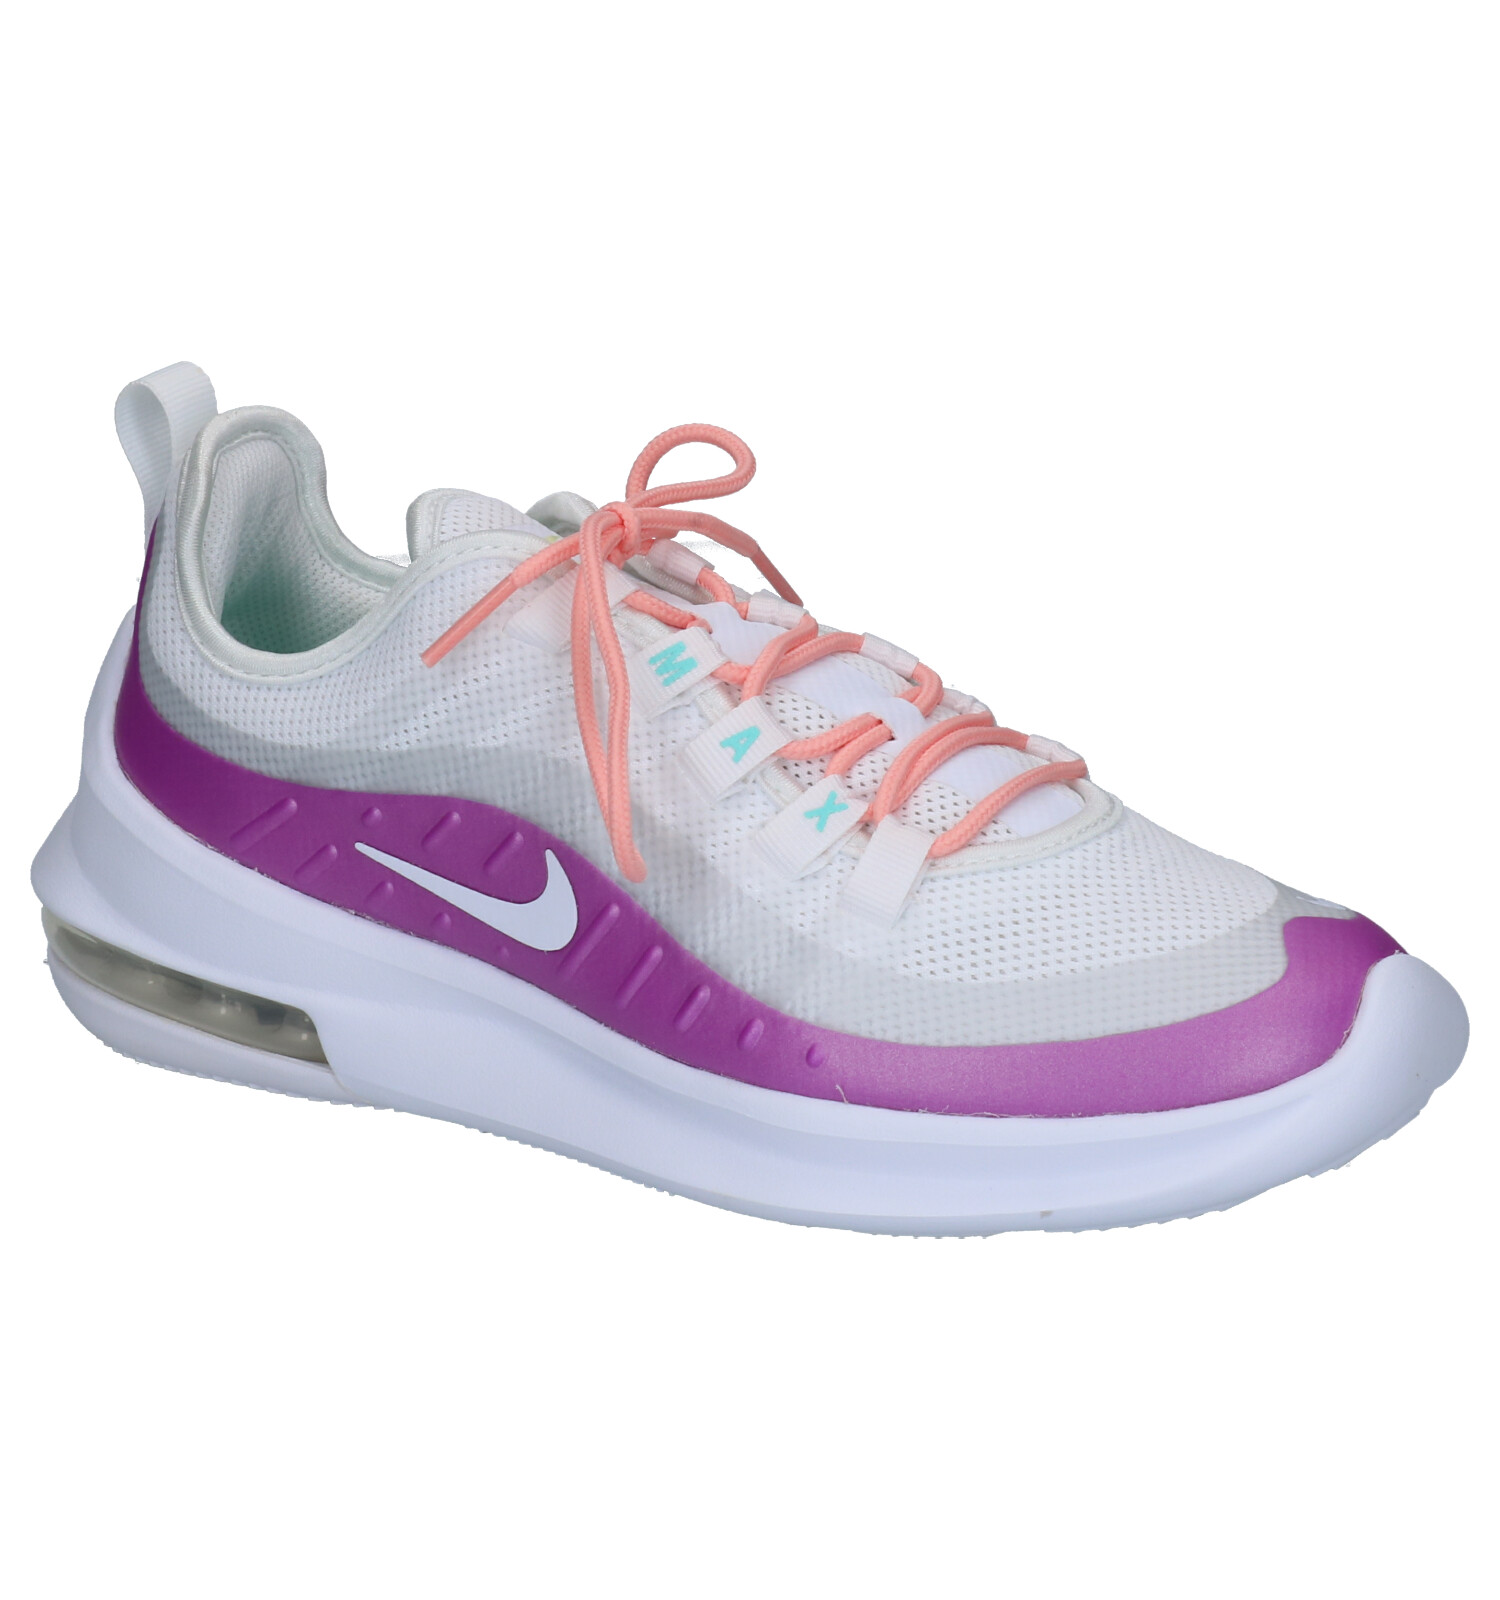 Nike Air Max Sneakers Wit | SCHOENENTORFS.NL | Gratis verzend en retour